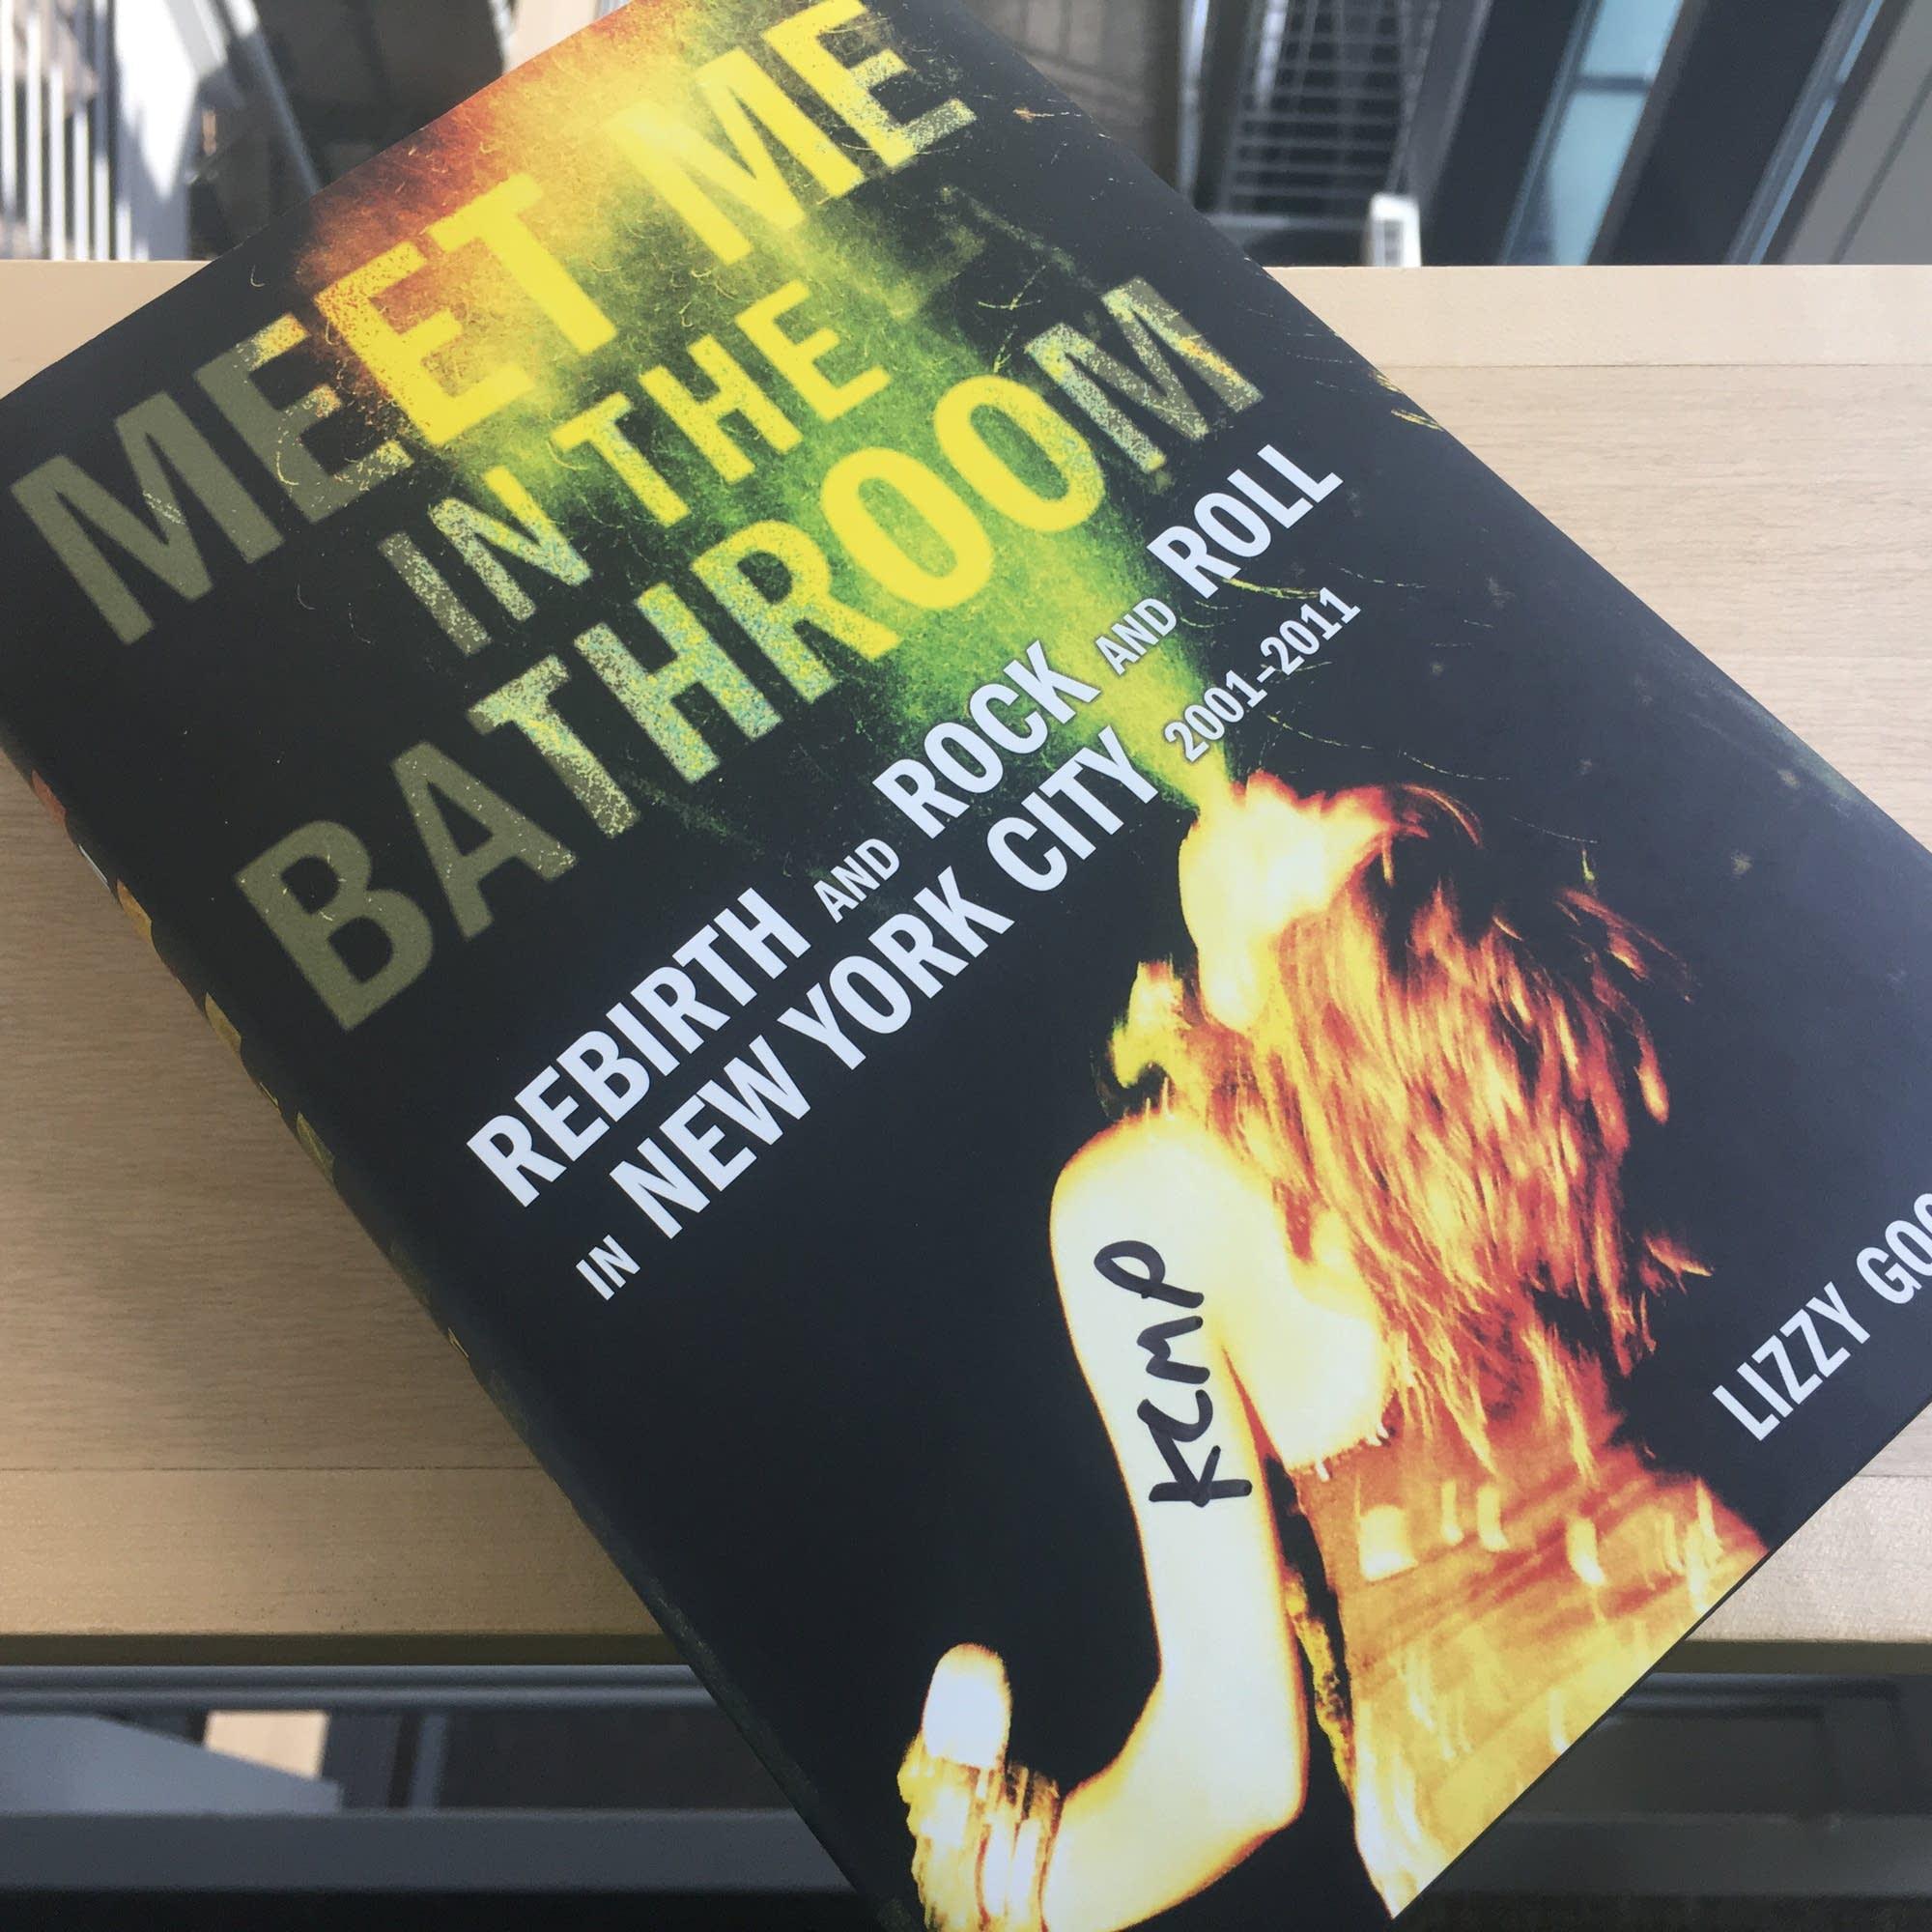 Lizzy Goodman's 'Meet Me in the Bathroom.'